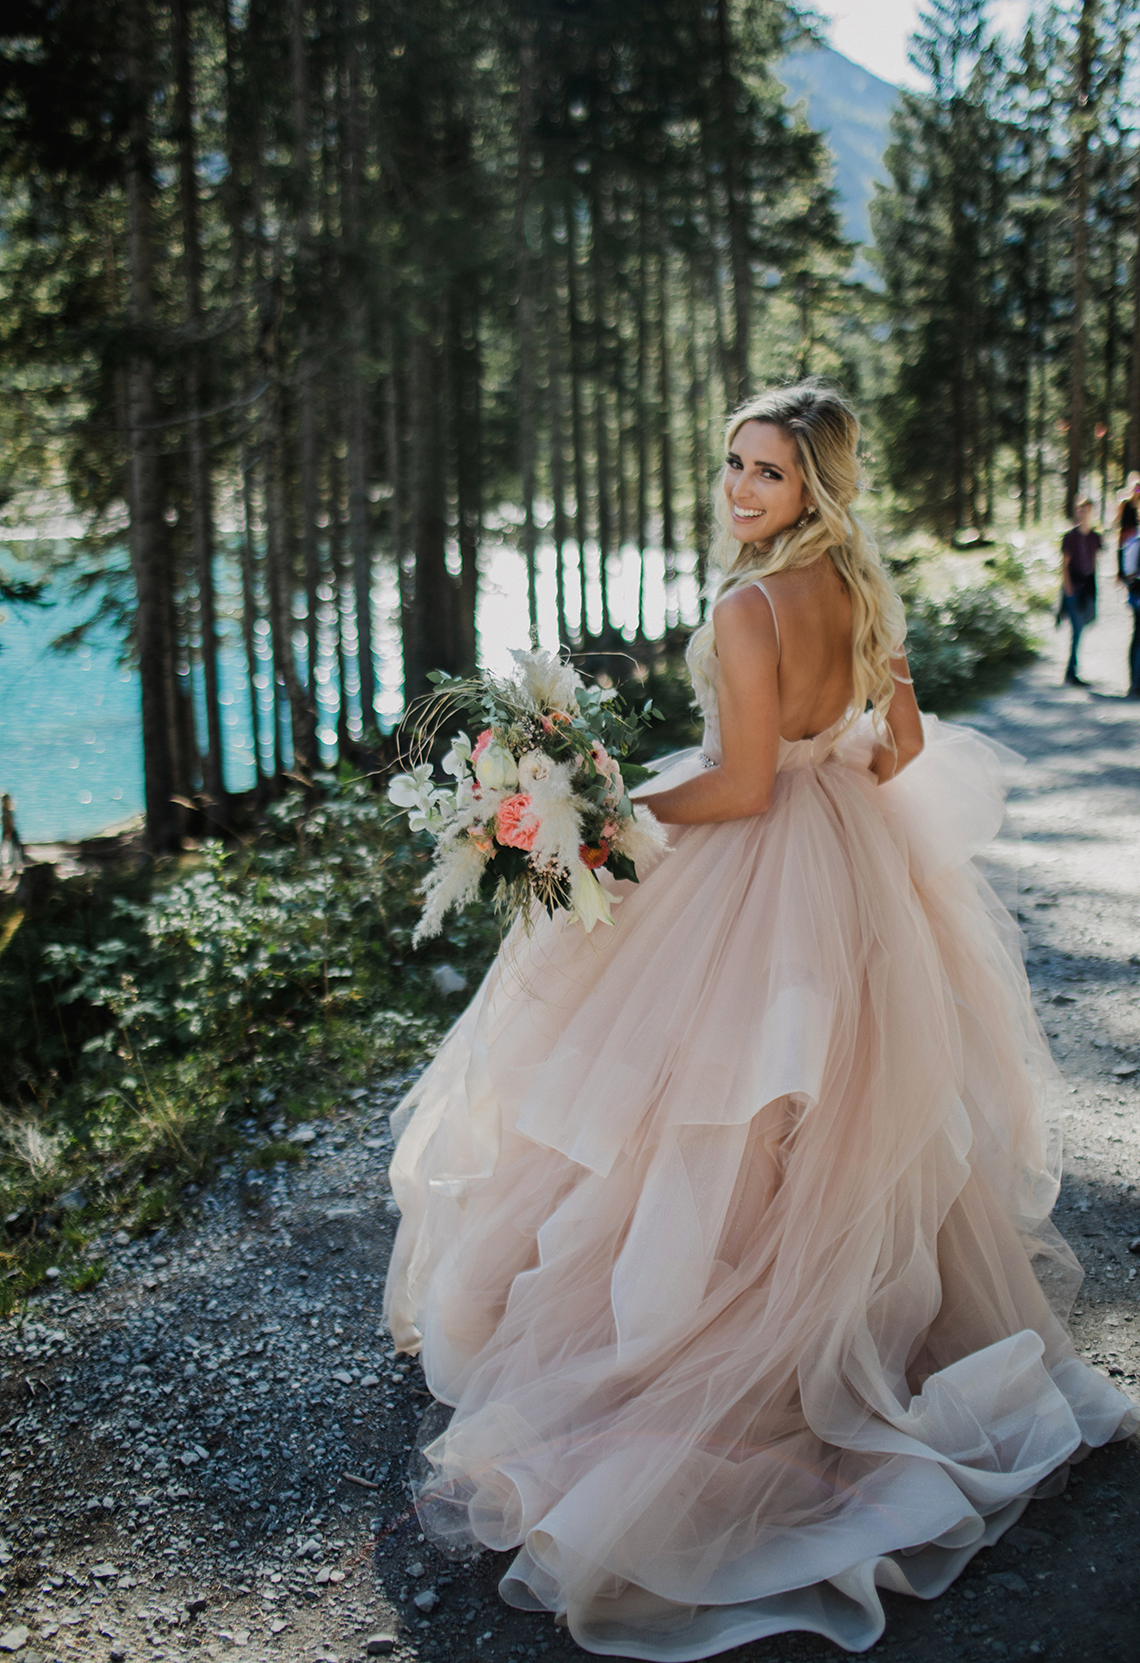 Amazing Adventurous Swiss Alps Mountain Wedding – Unveiled Radiance Photography 35